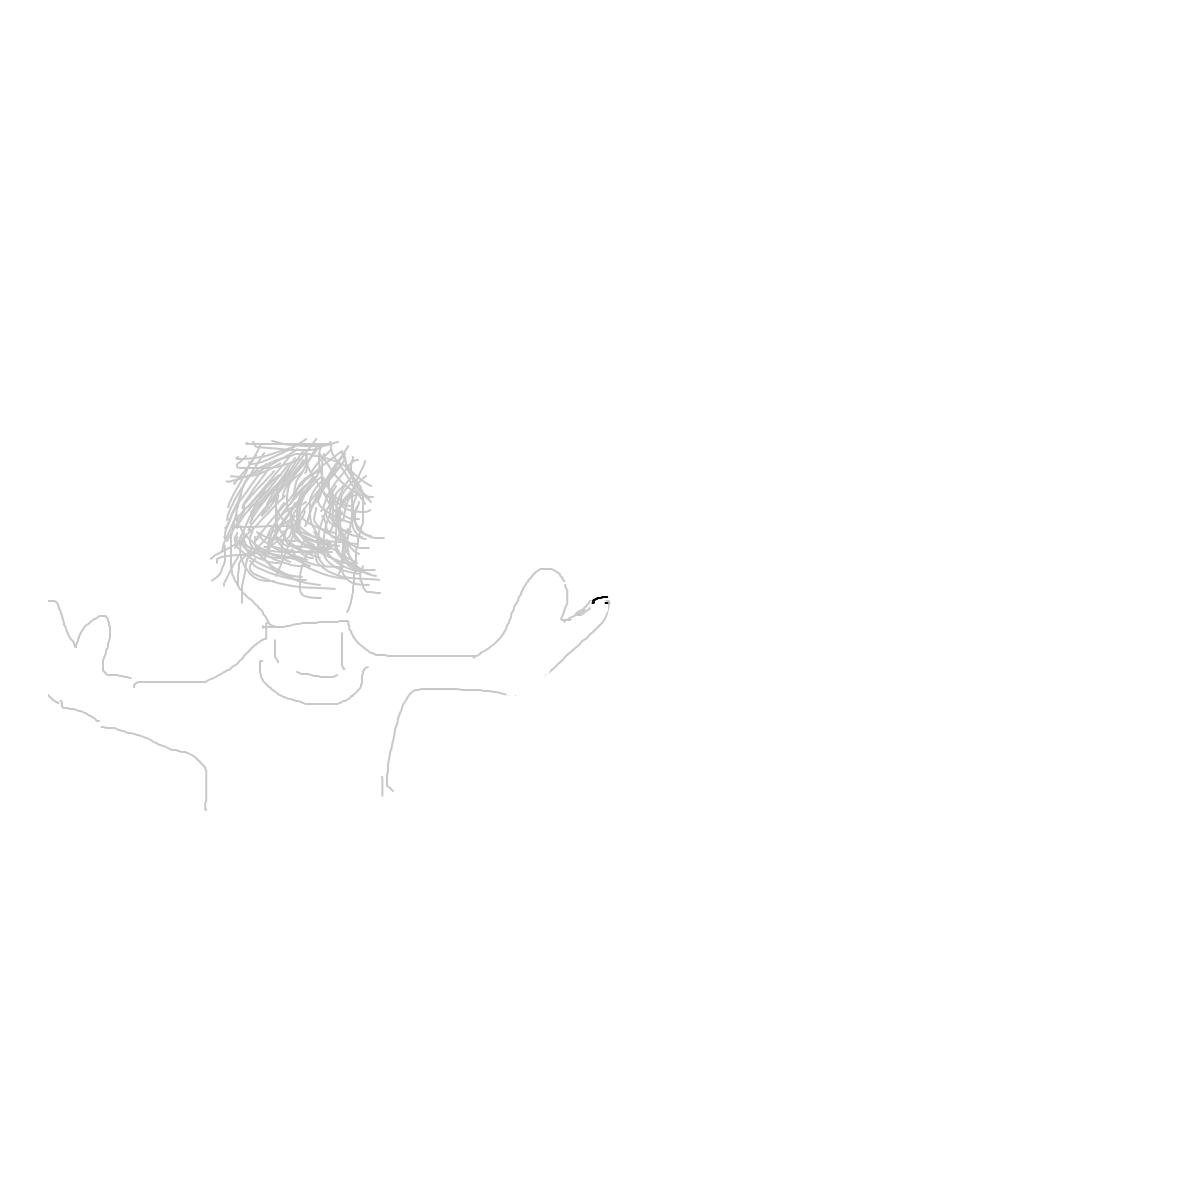 BAAAM drawing#5261 lat:39.9655990600585940lng: -75.1809005737304700